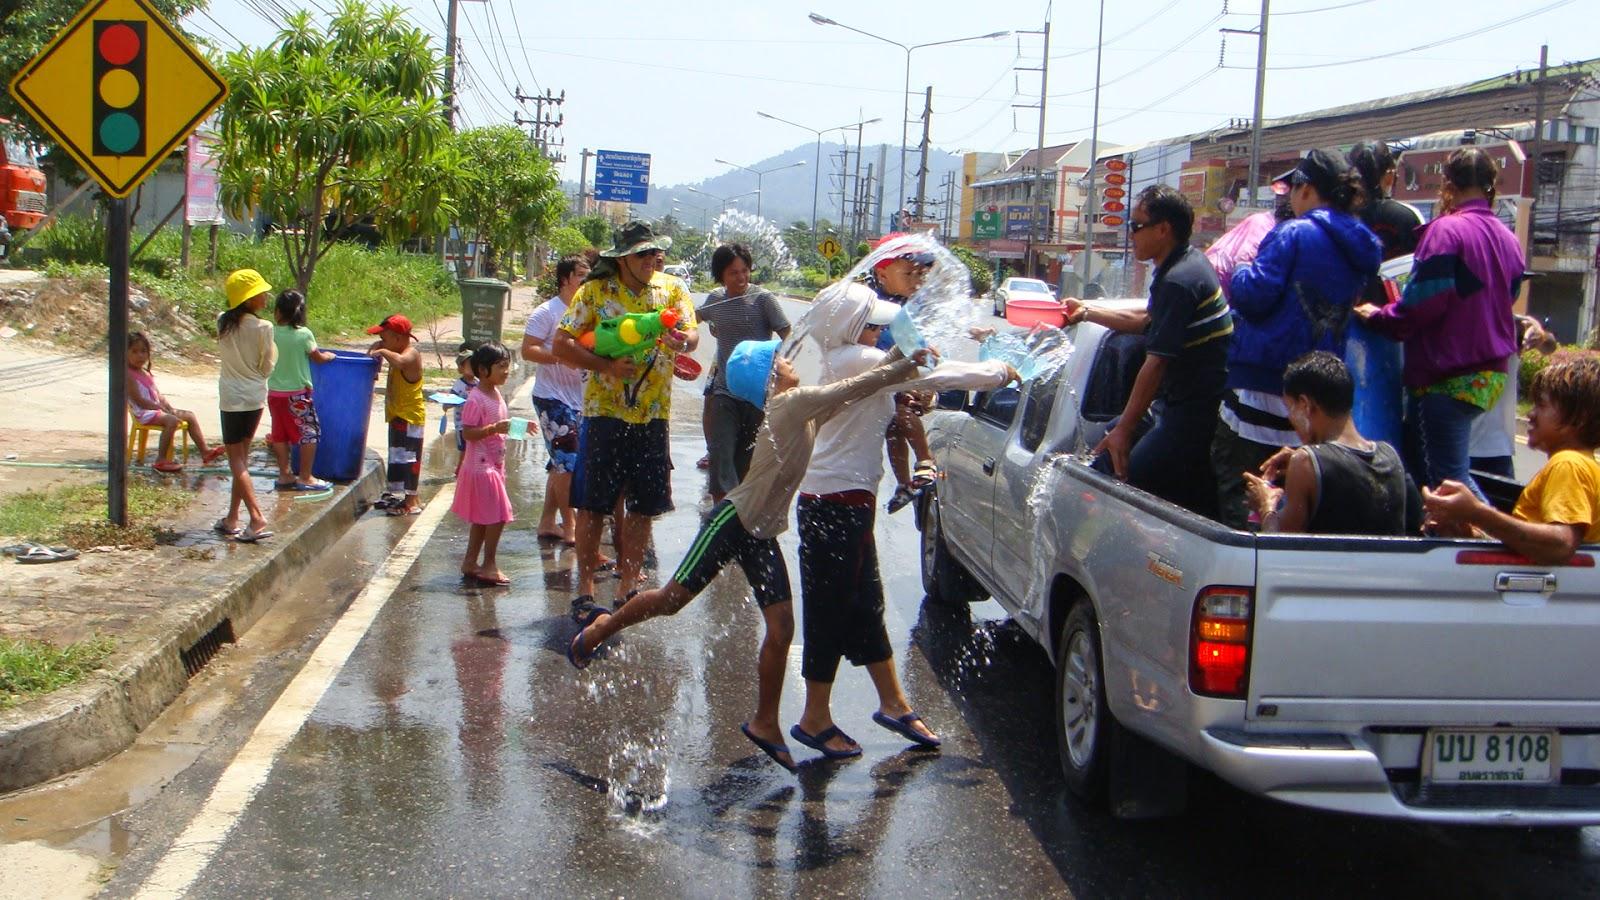 Thailand New Year Day - Songkran Day